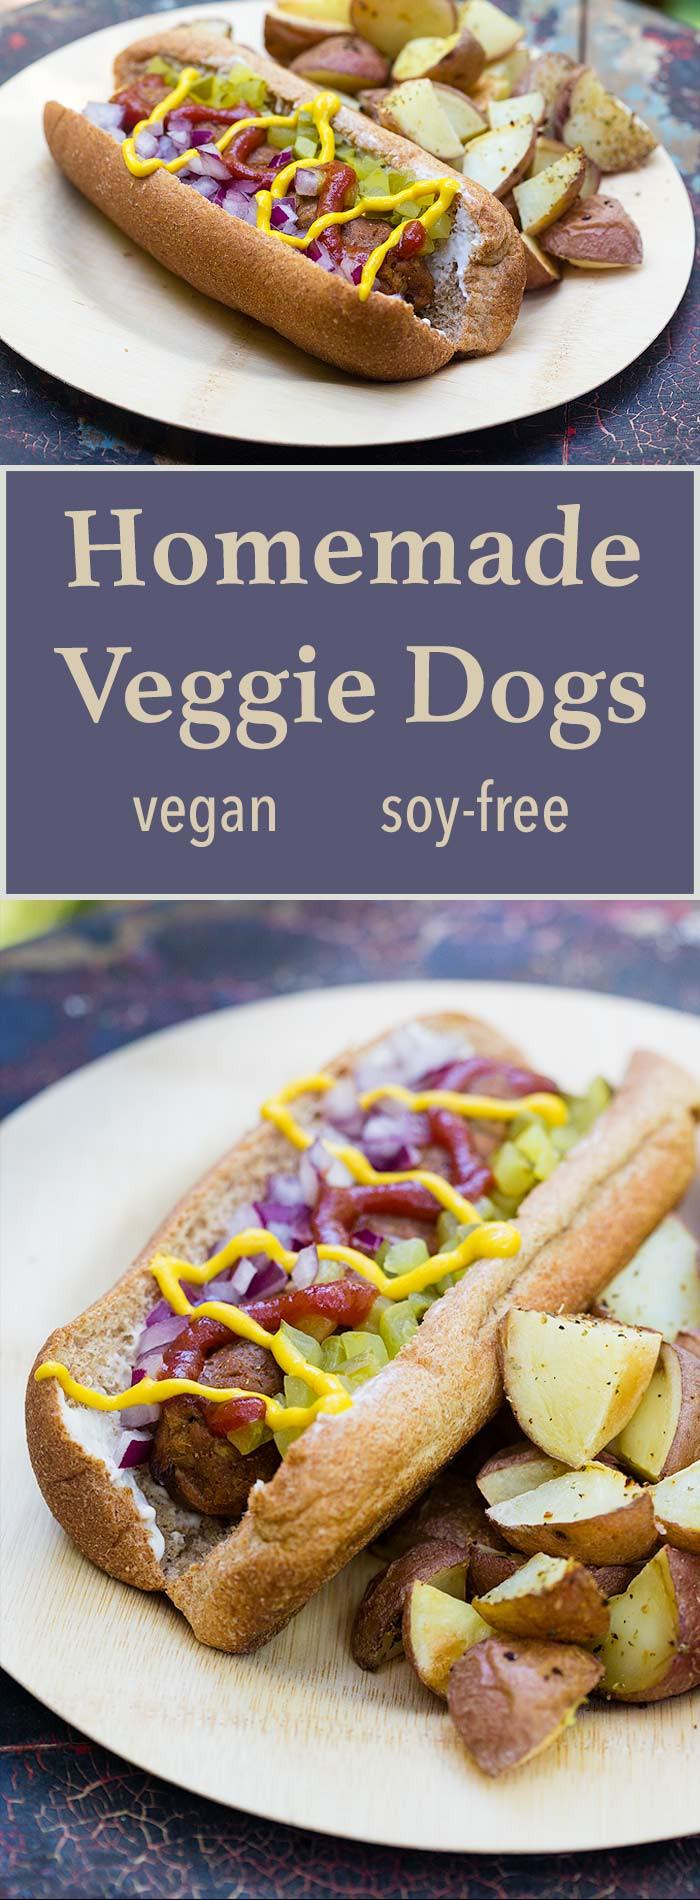 Best Vegan Hot Dogs  vegan hot dog ingre nts